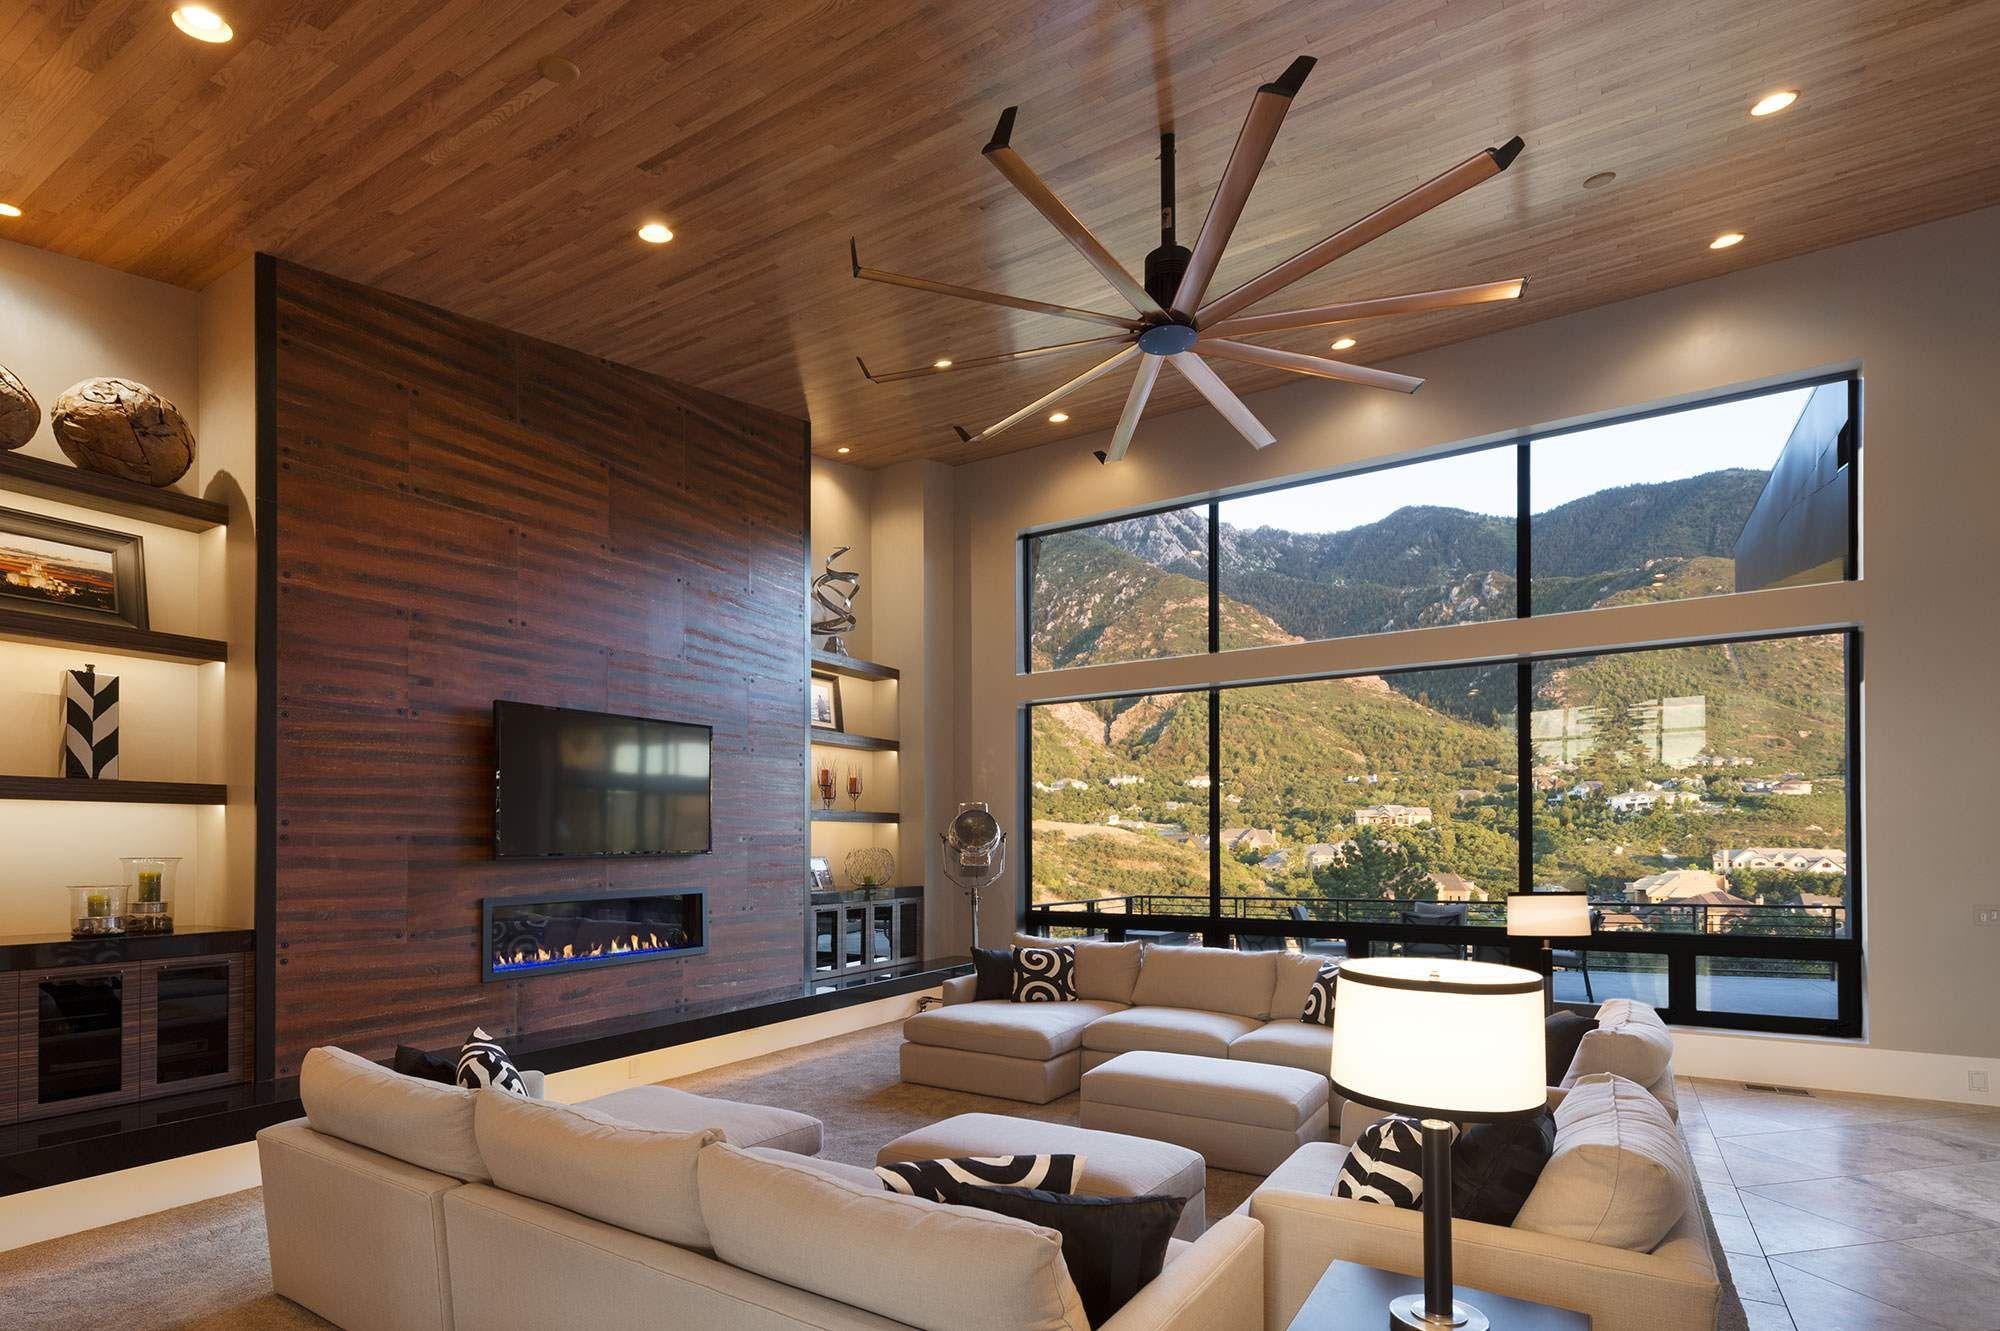 Gallery Living Room Fans Room Fan Unique House Design